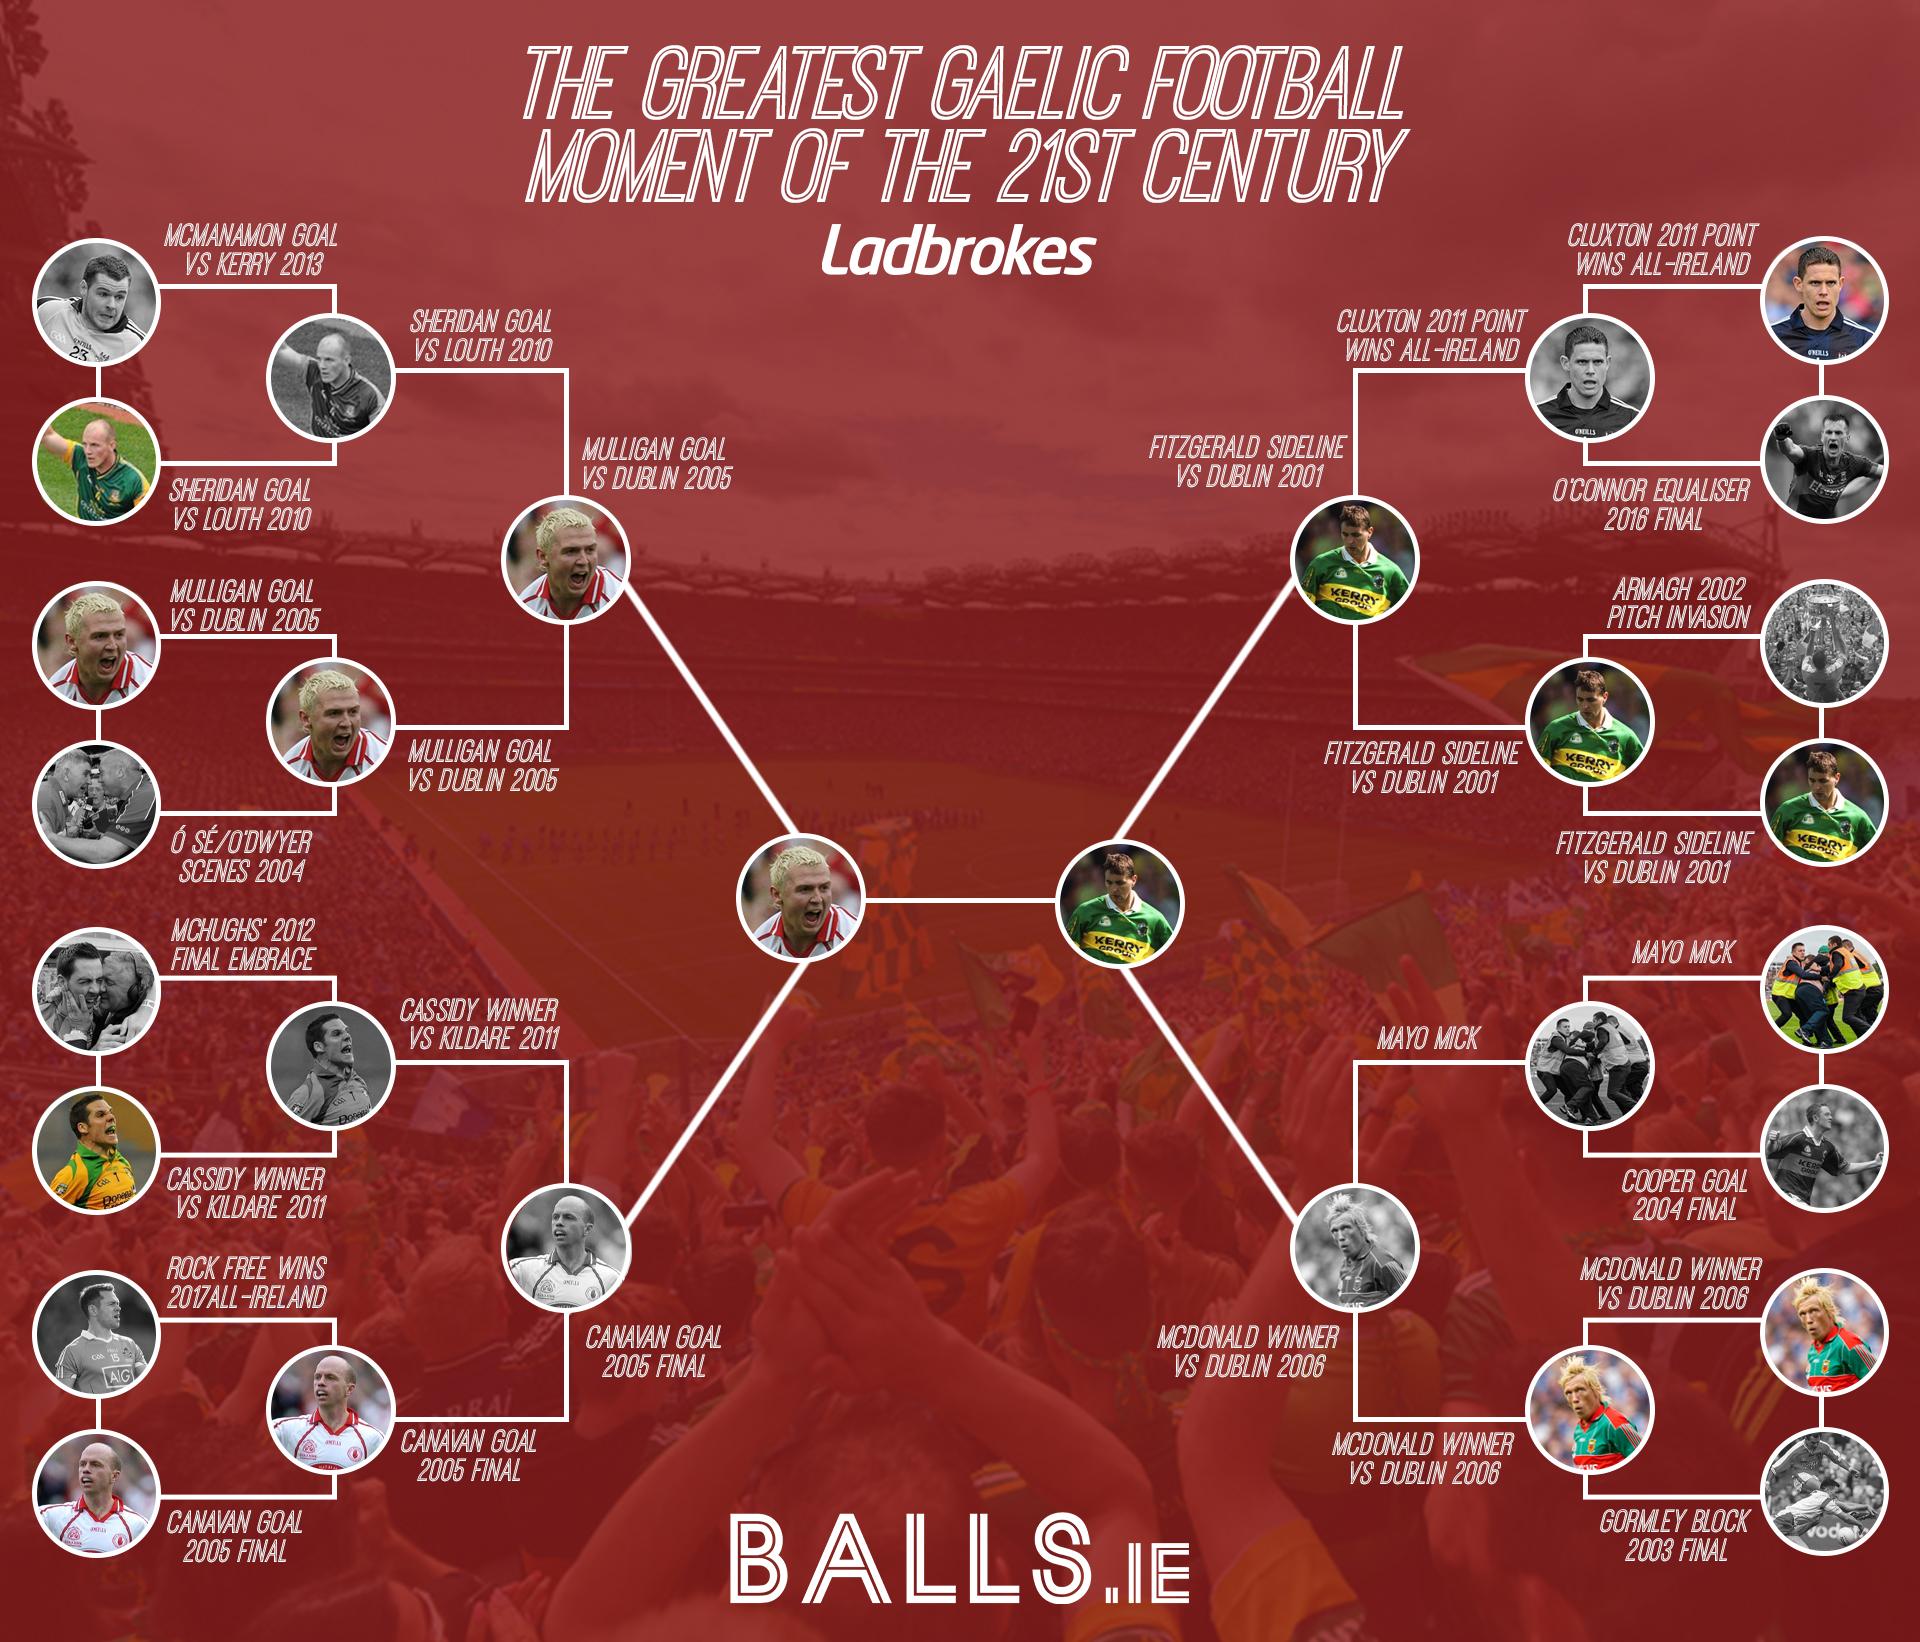 Greatest gaelic football moment